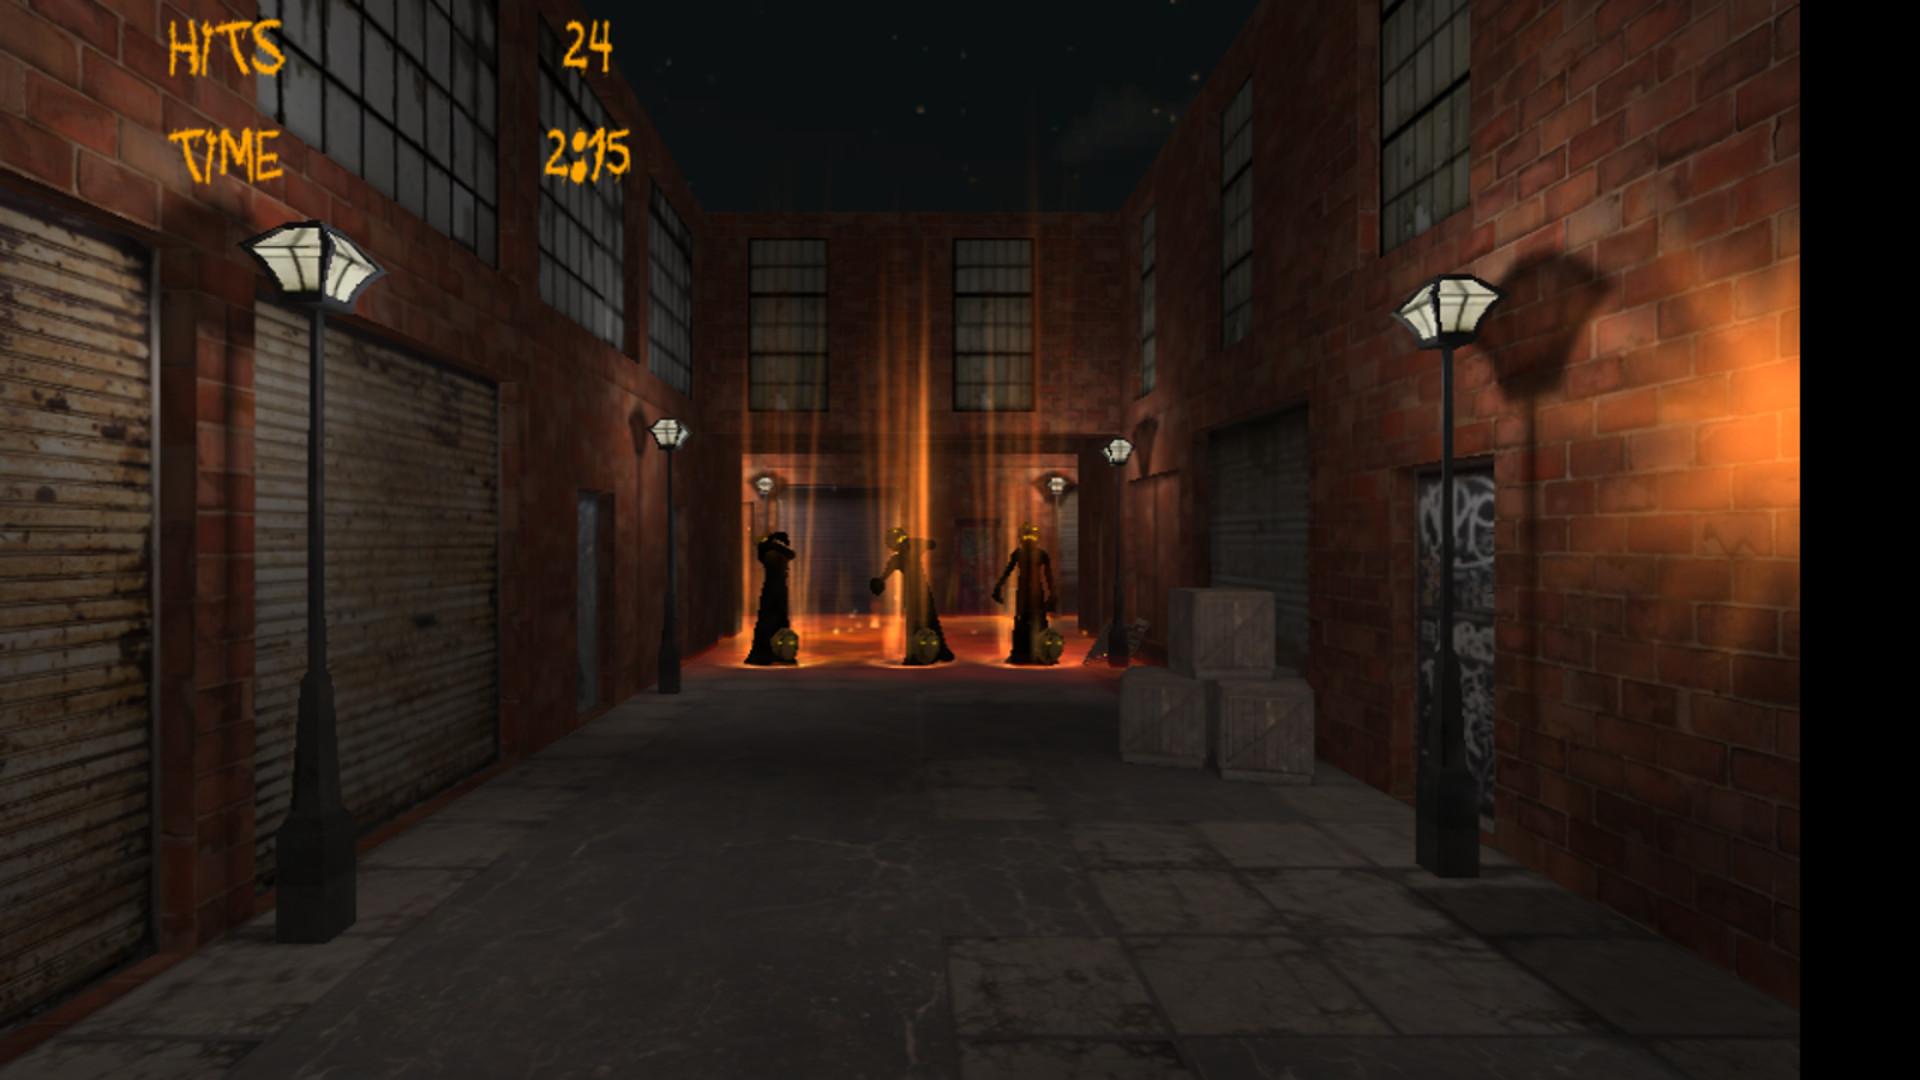 Jack-O-Lantern Covers of Darkness Fiyat Karşılaştırma